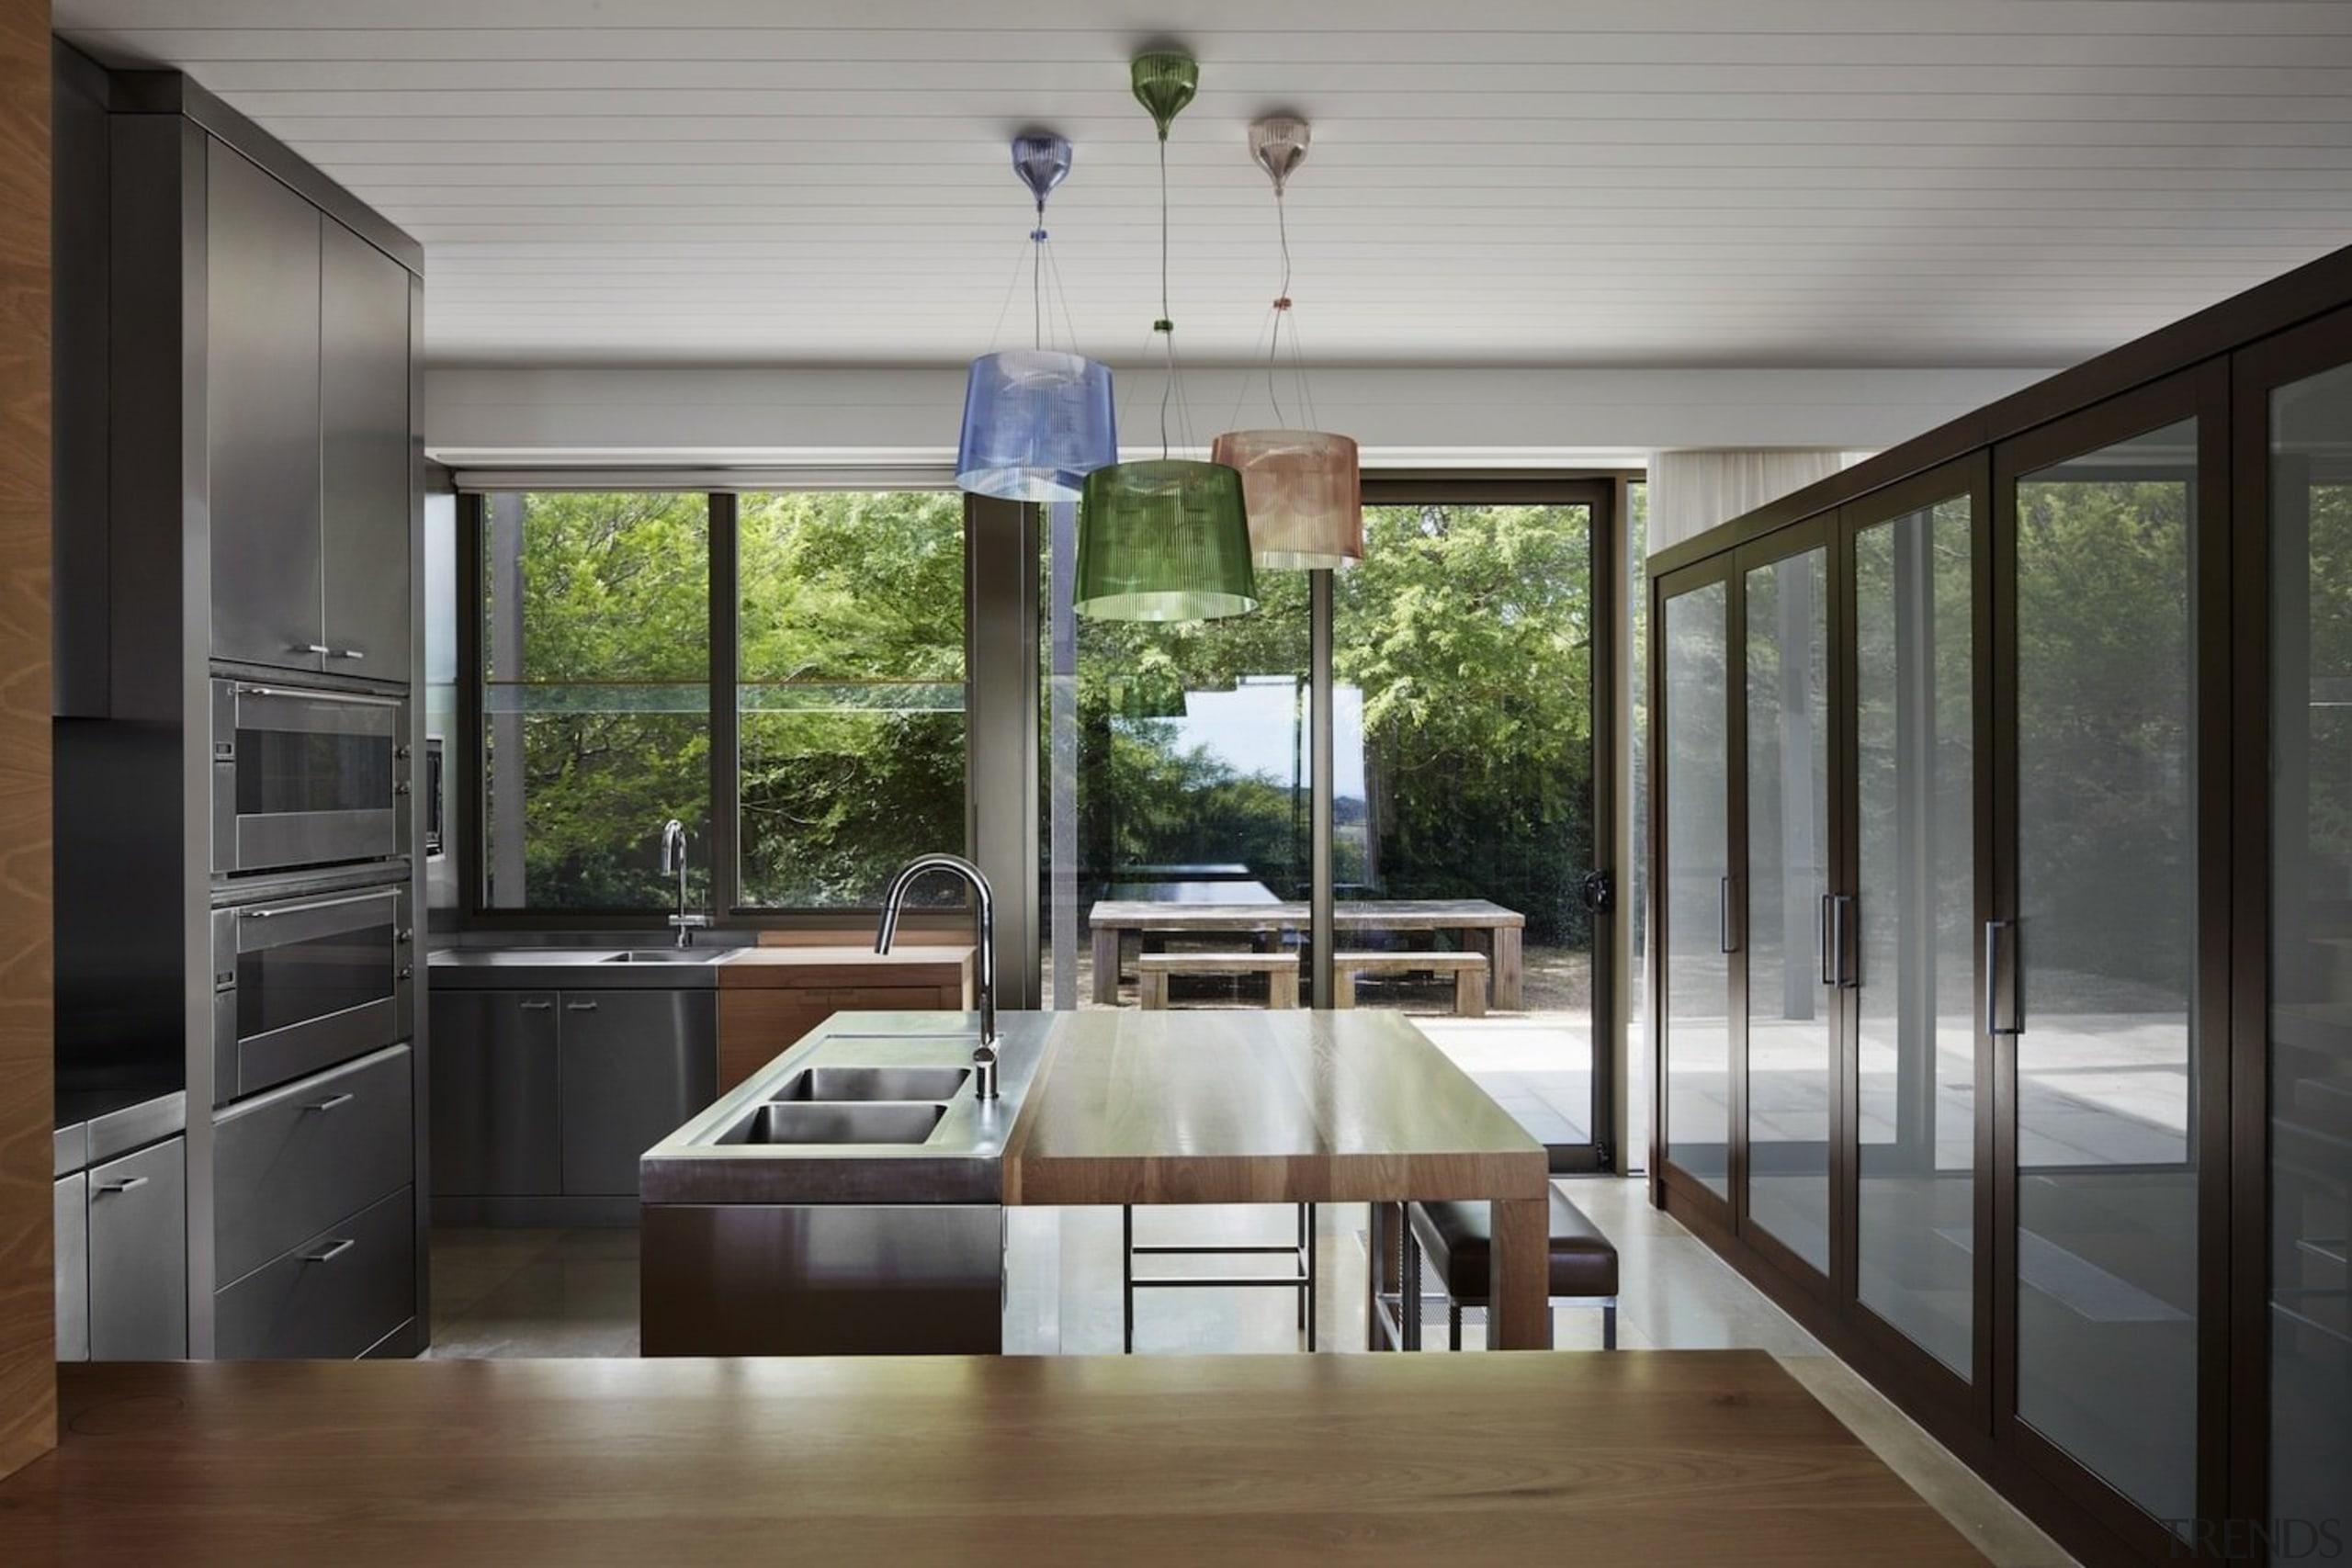 Architect: B.E Architecture architecture, daylighting, door, house, interior design, real estate, window, gray, black